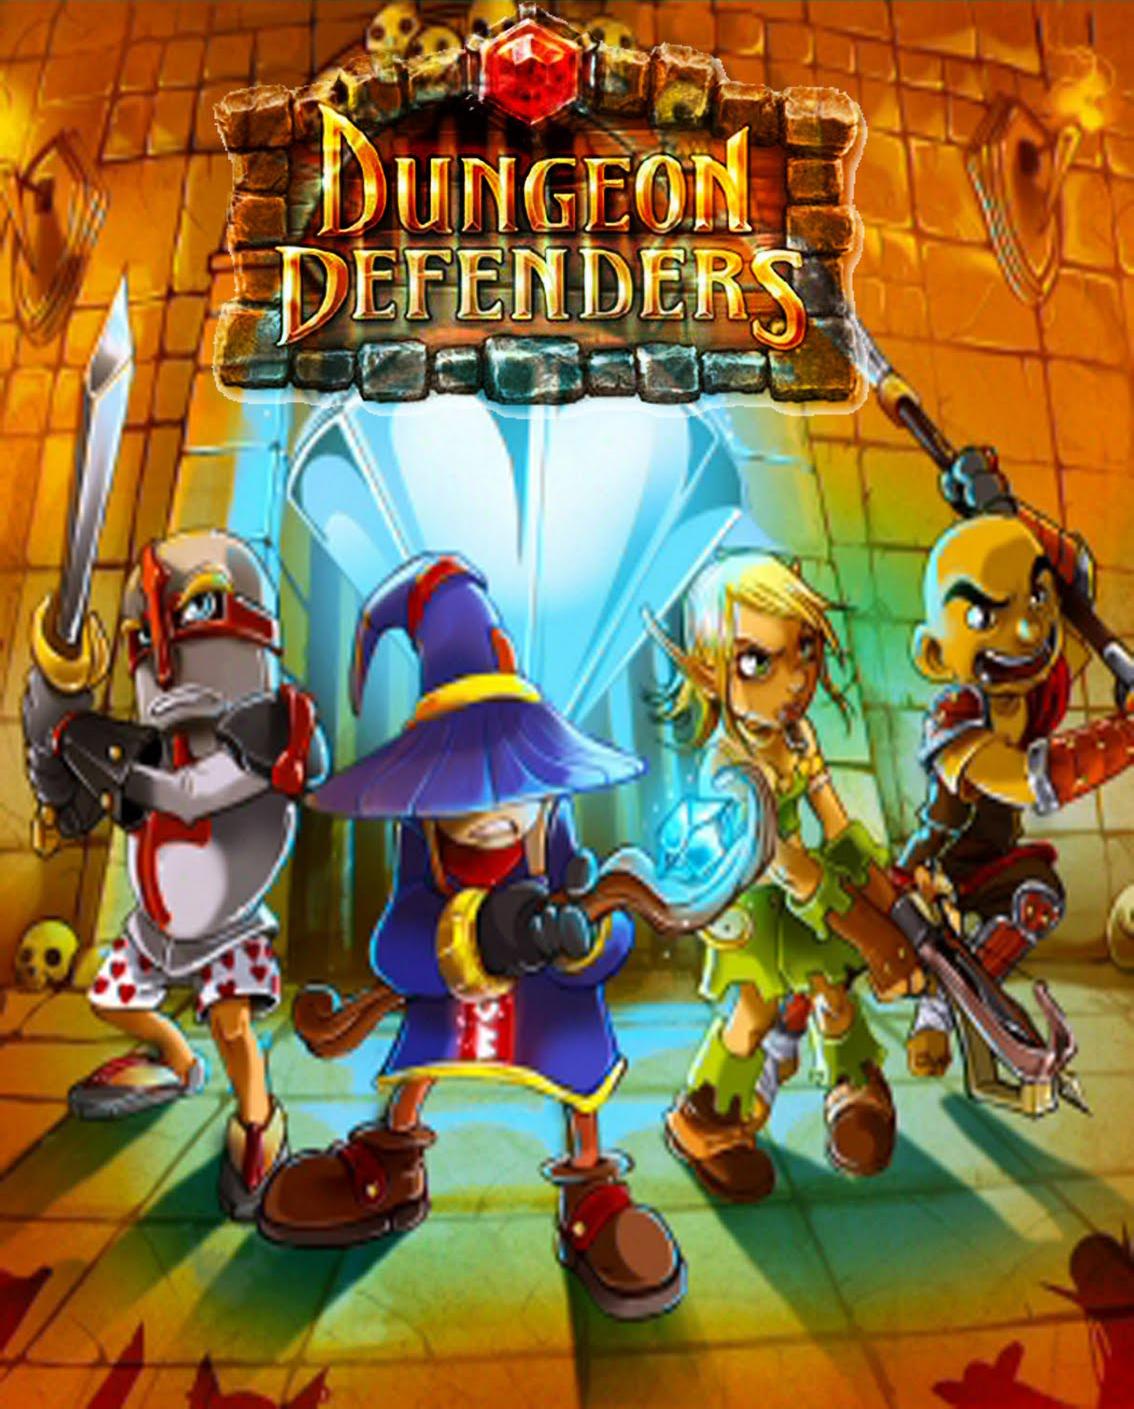 Fandomania dungeon defenders review xbla - Dungeon defenders 2 console ...